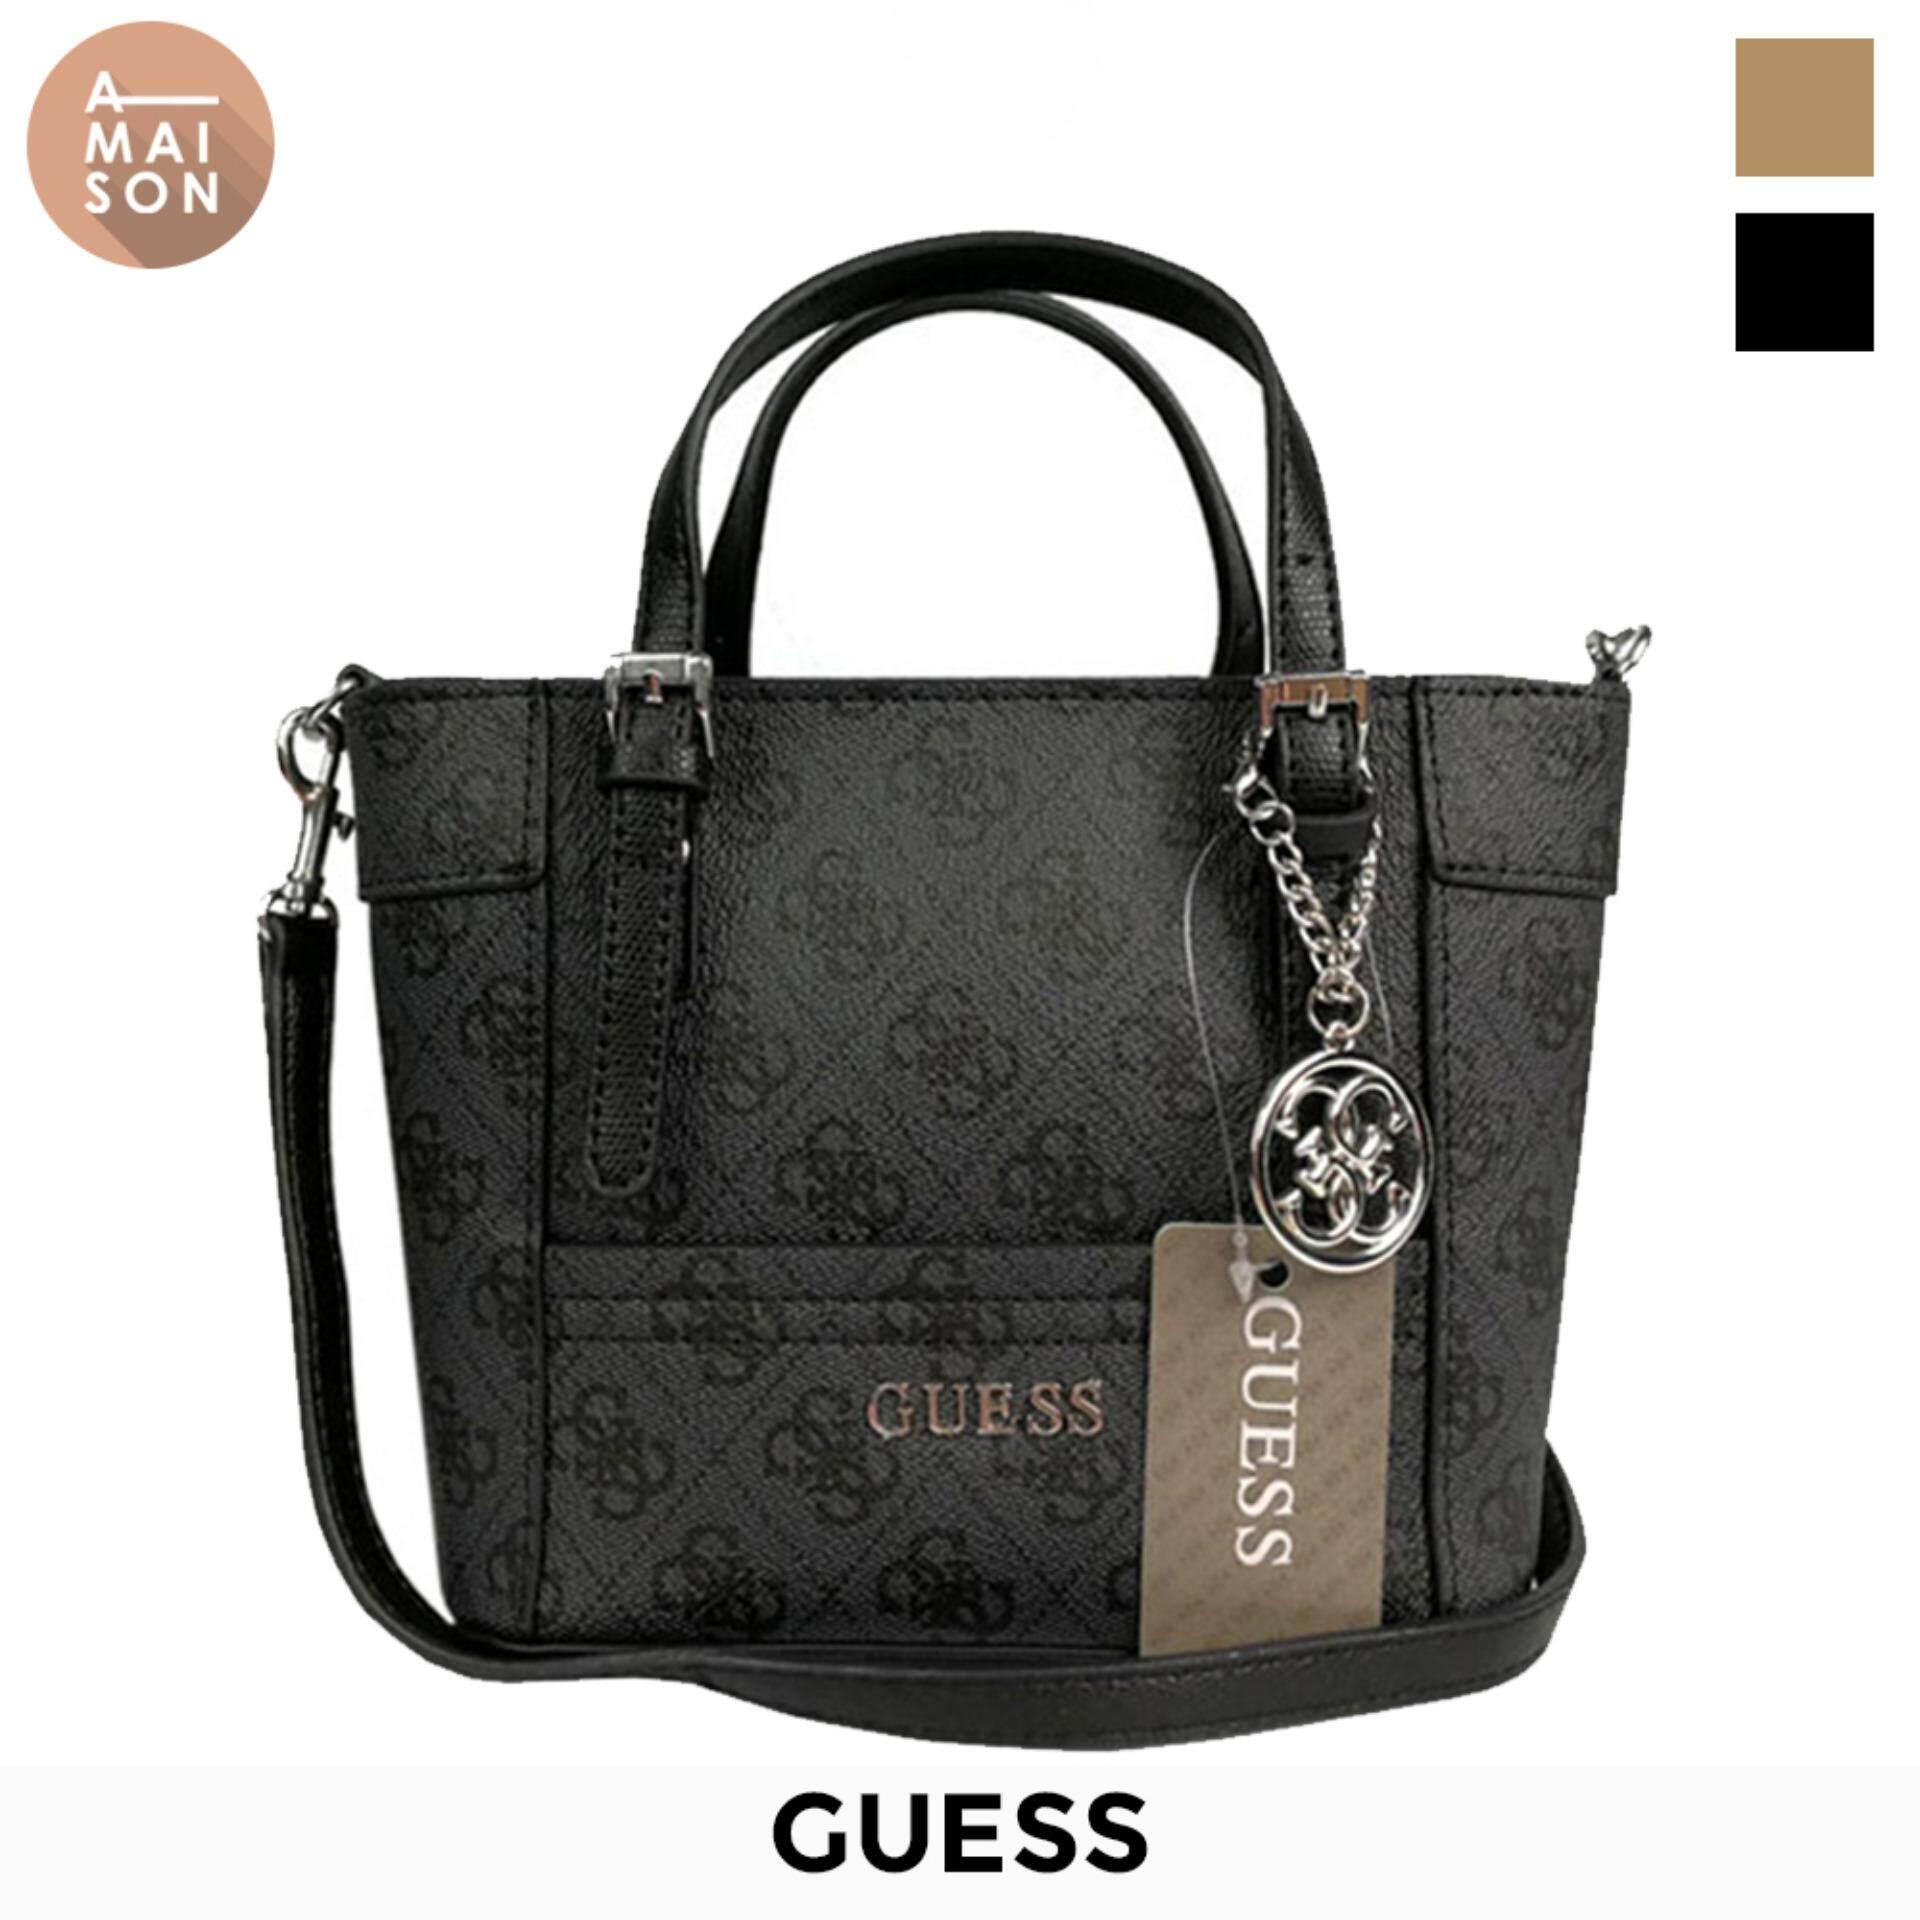 Authentic Guess Imported Delaney Logo Pattern Pee Mini Crossbody Handbag Messenger Sling Shoulder Bag